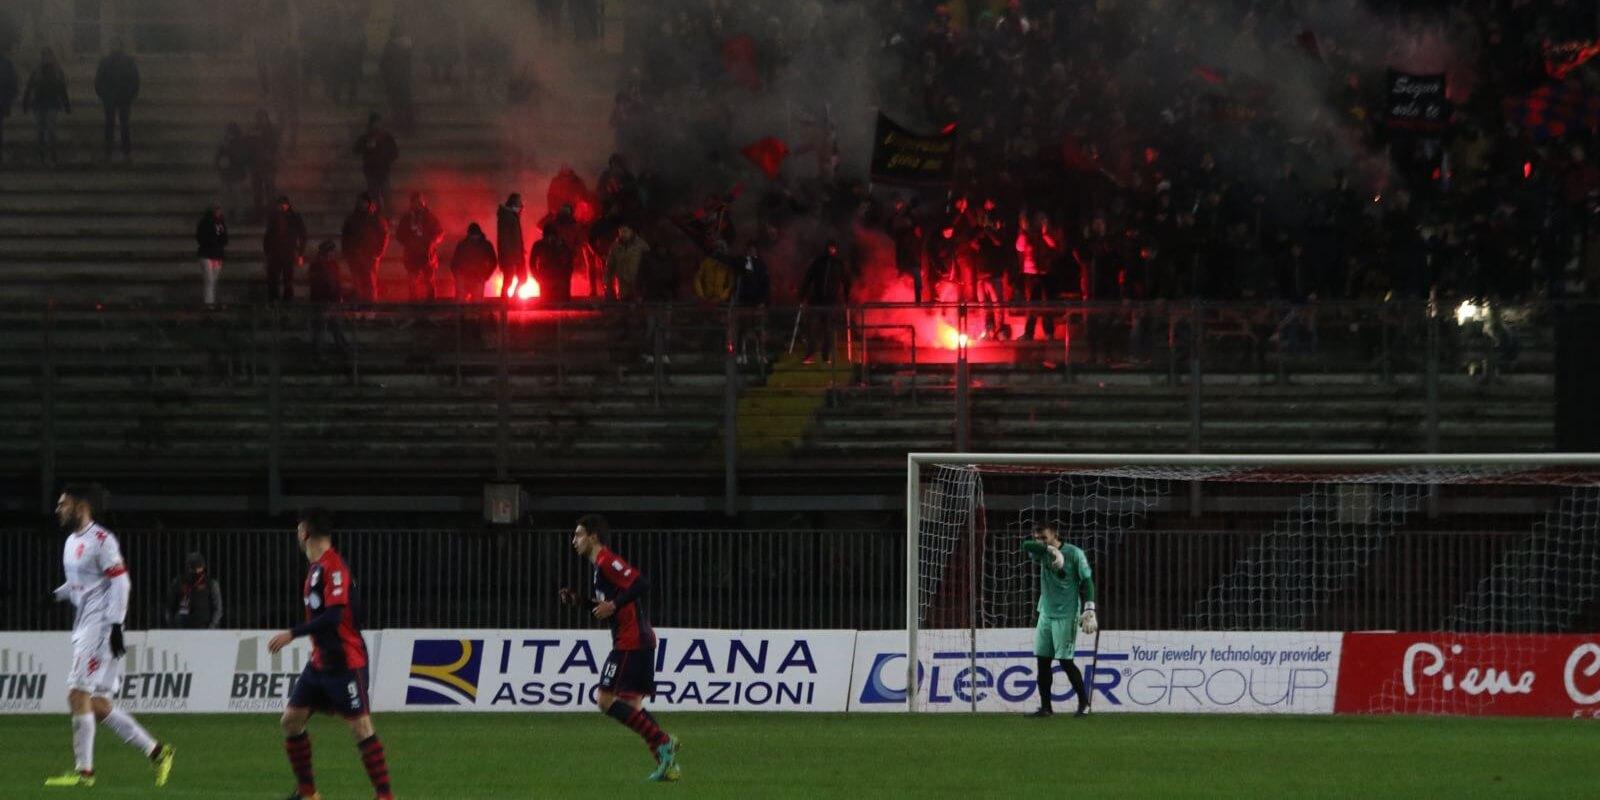 Padova-Samb